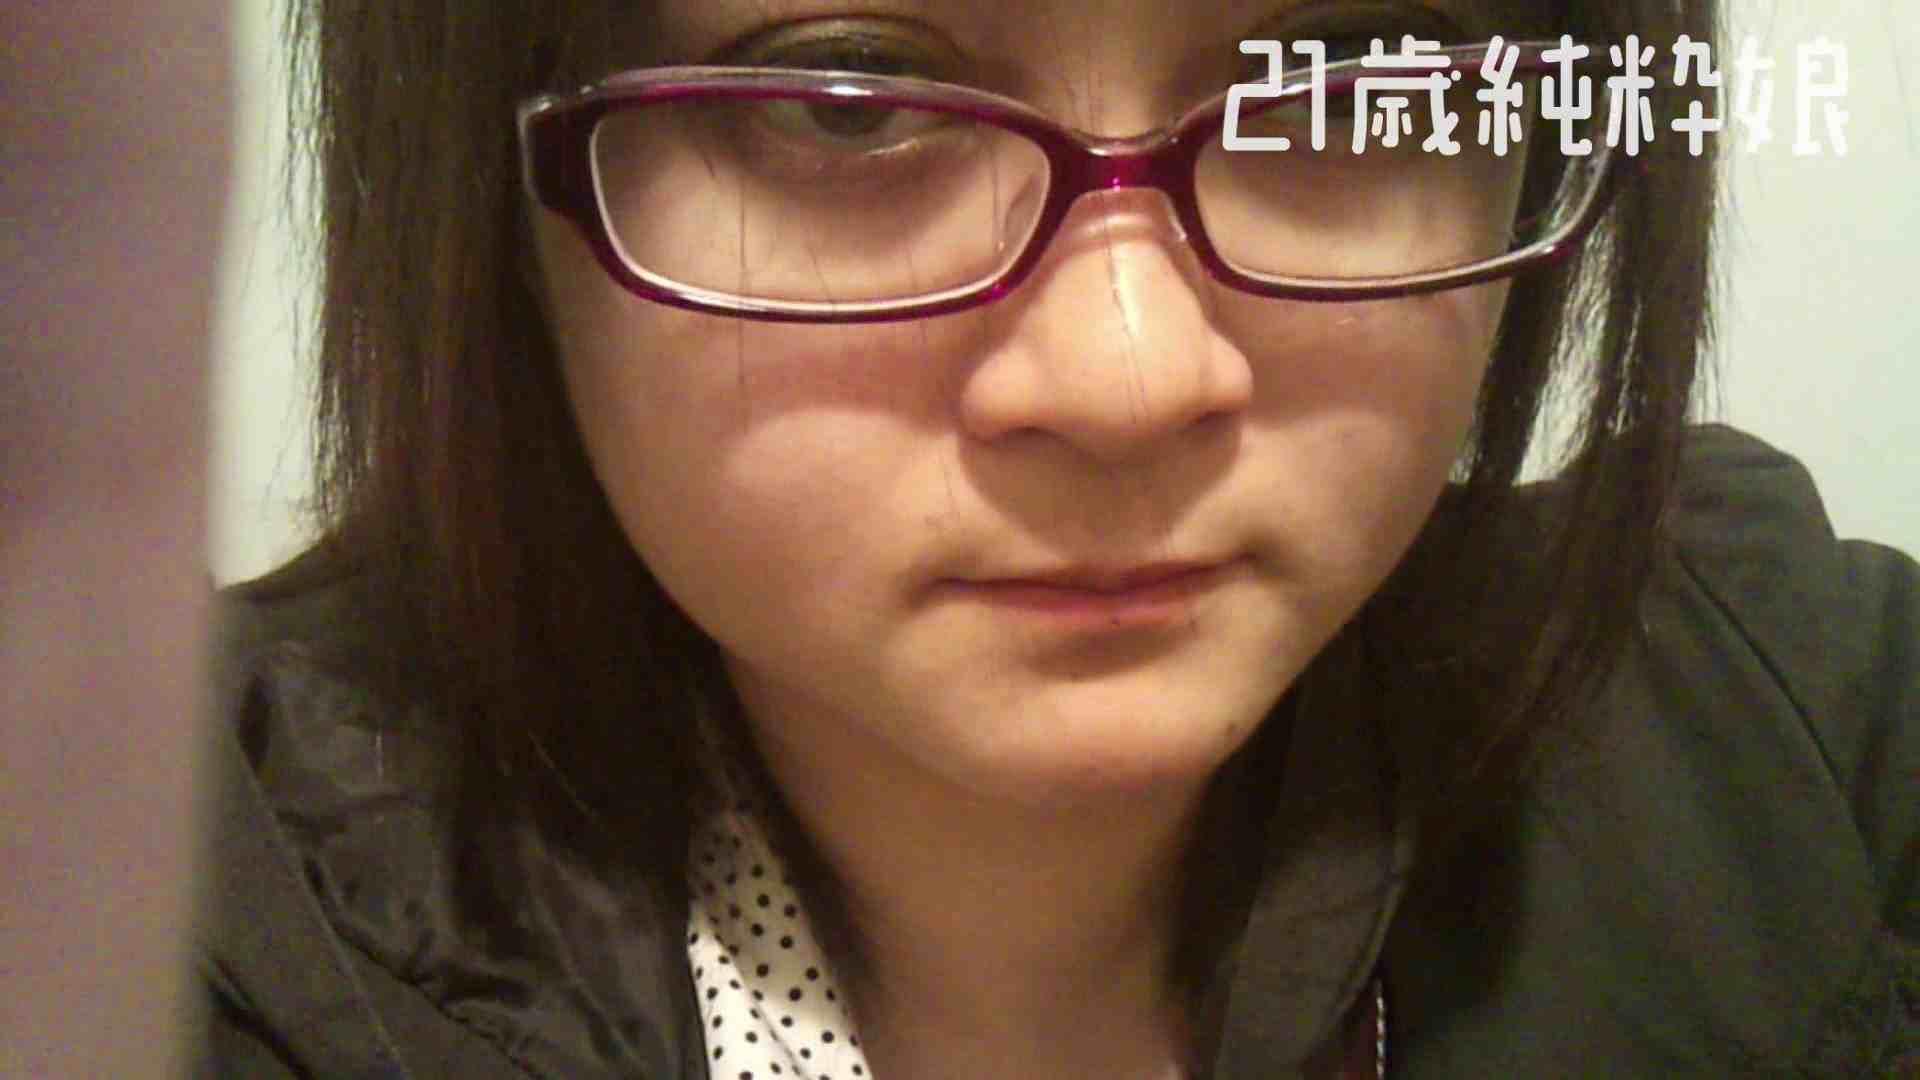 Gカップ21歳純粋嬢第2弾Vol.5 性欲丸出し | 学校  101pic 84